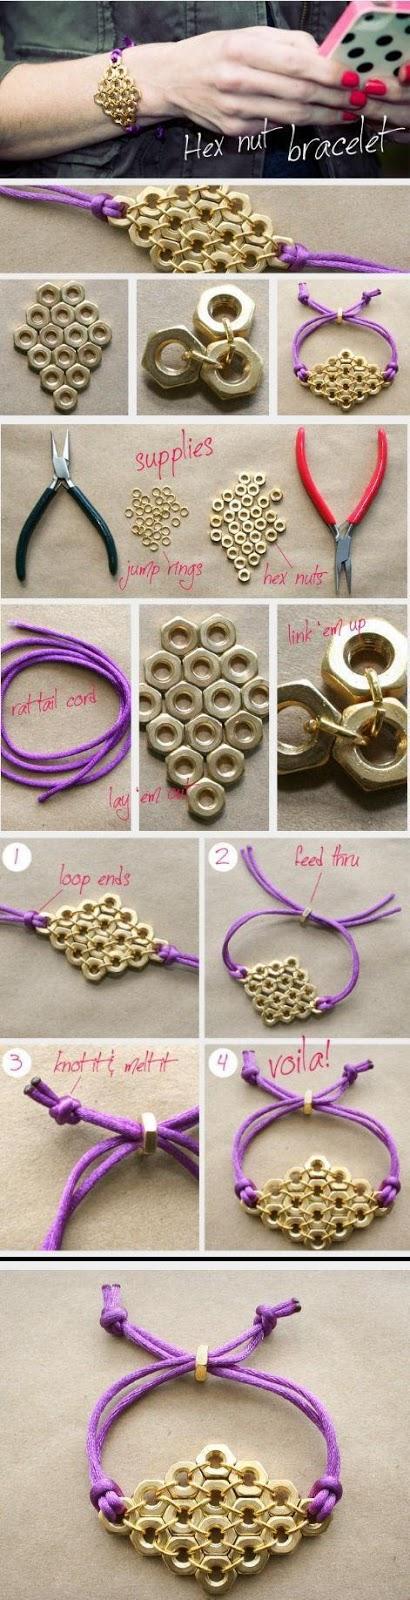 DIY Braceletes